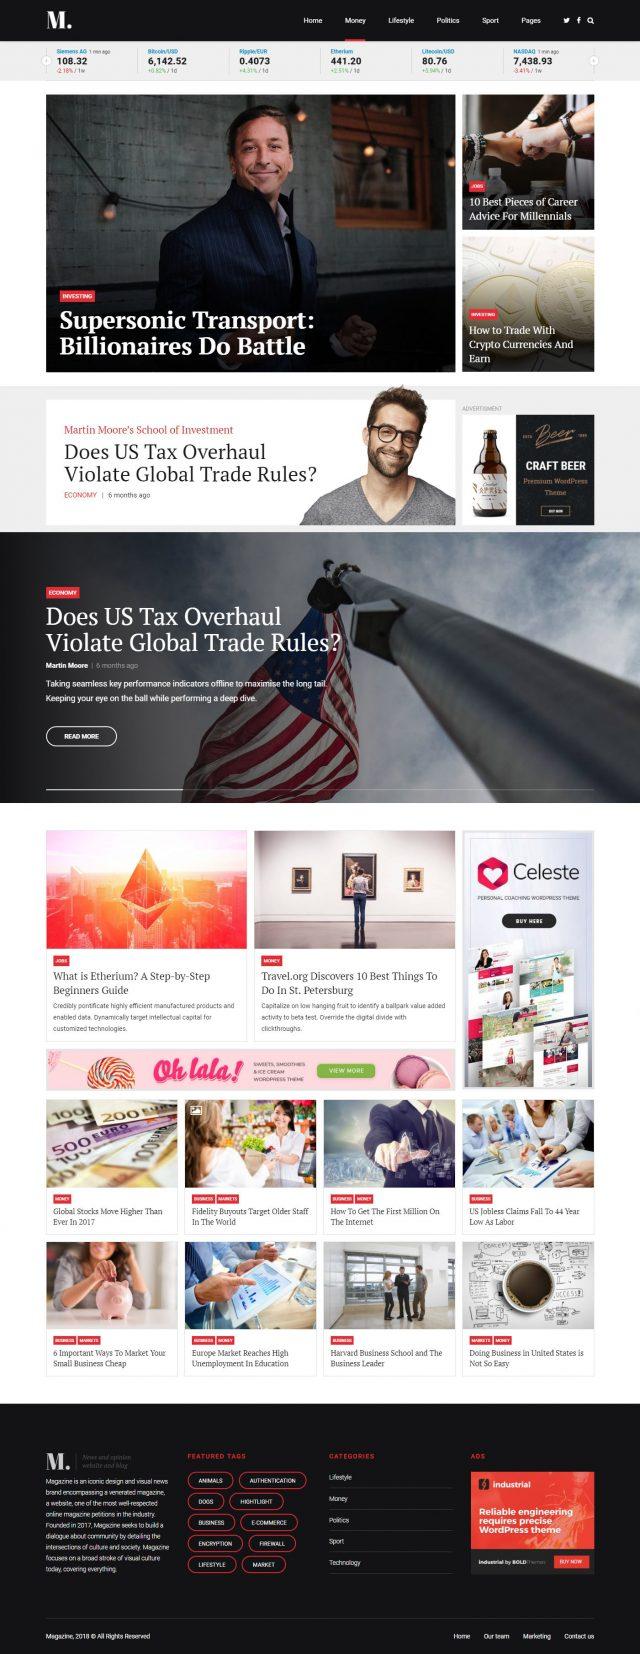 newstar wordpress theme business magazine homepage layout